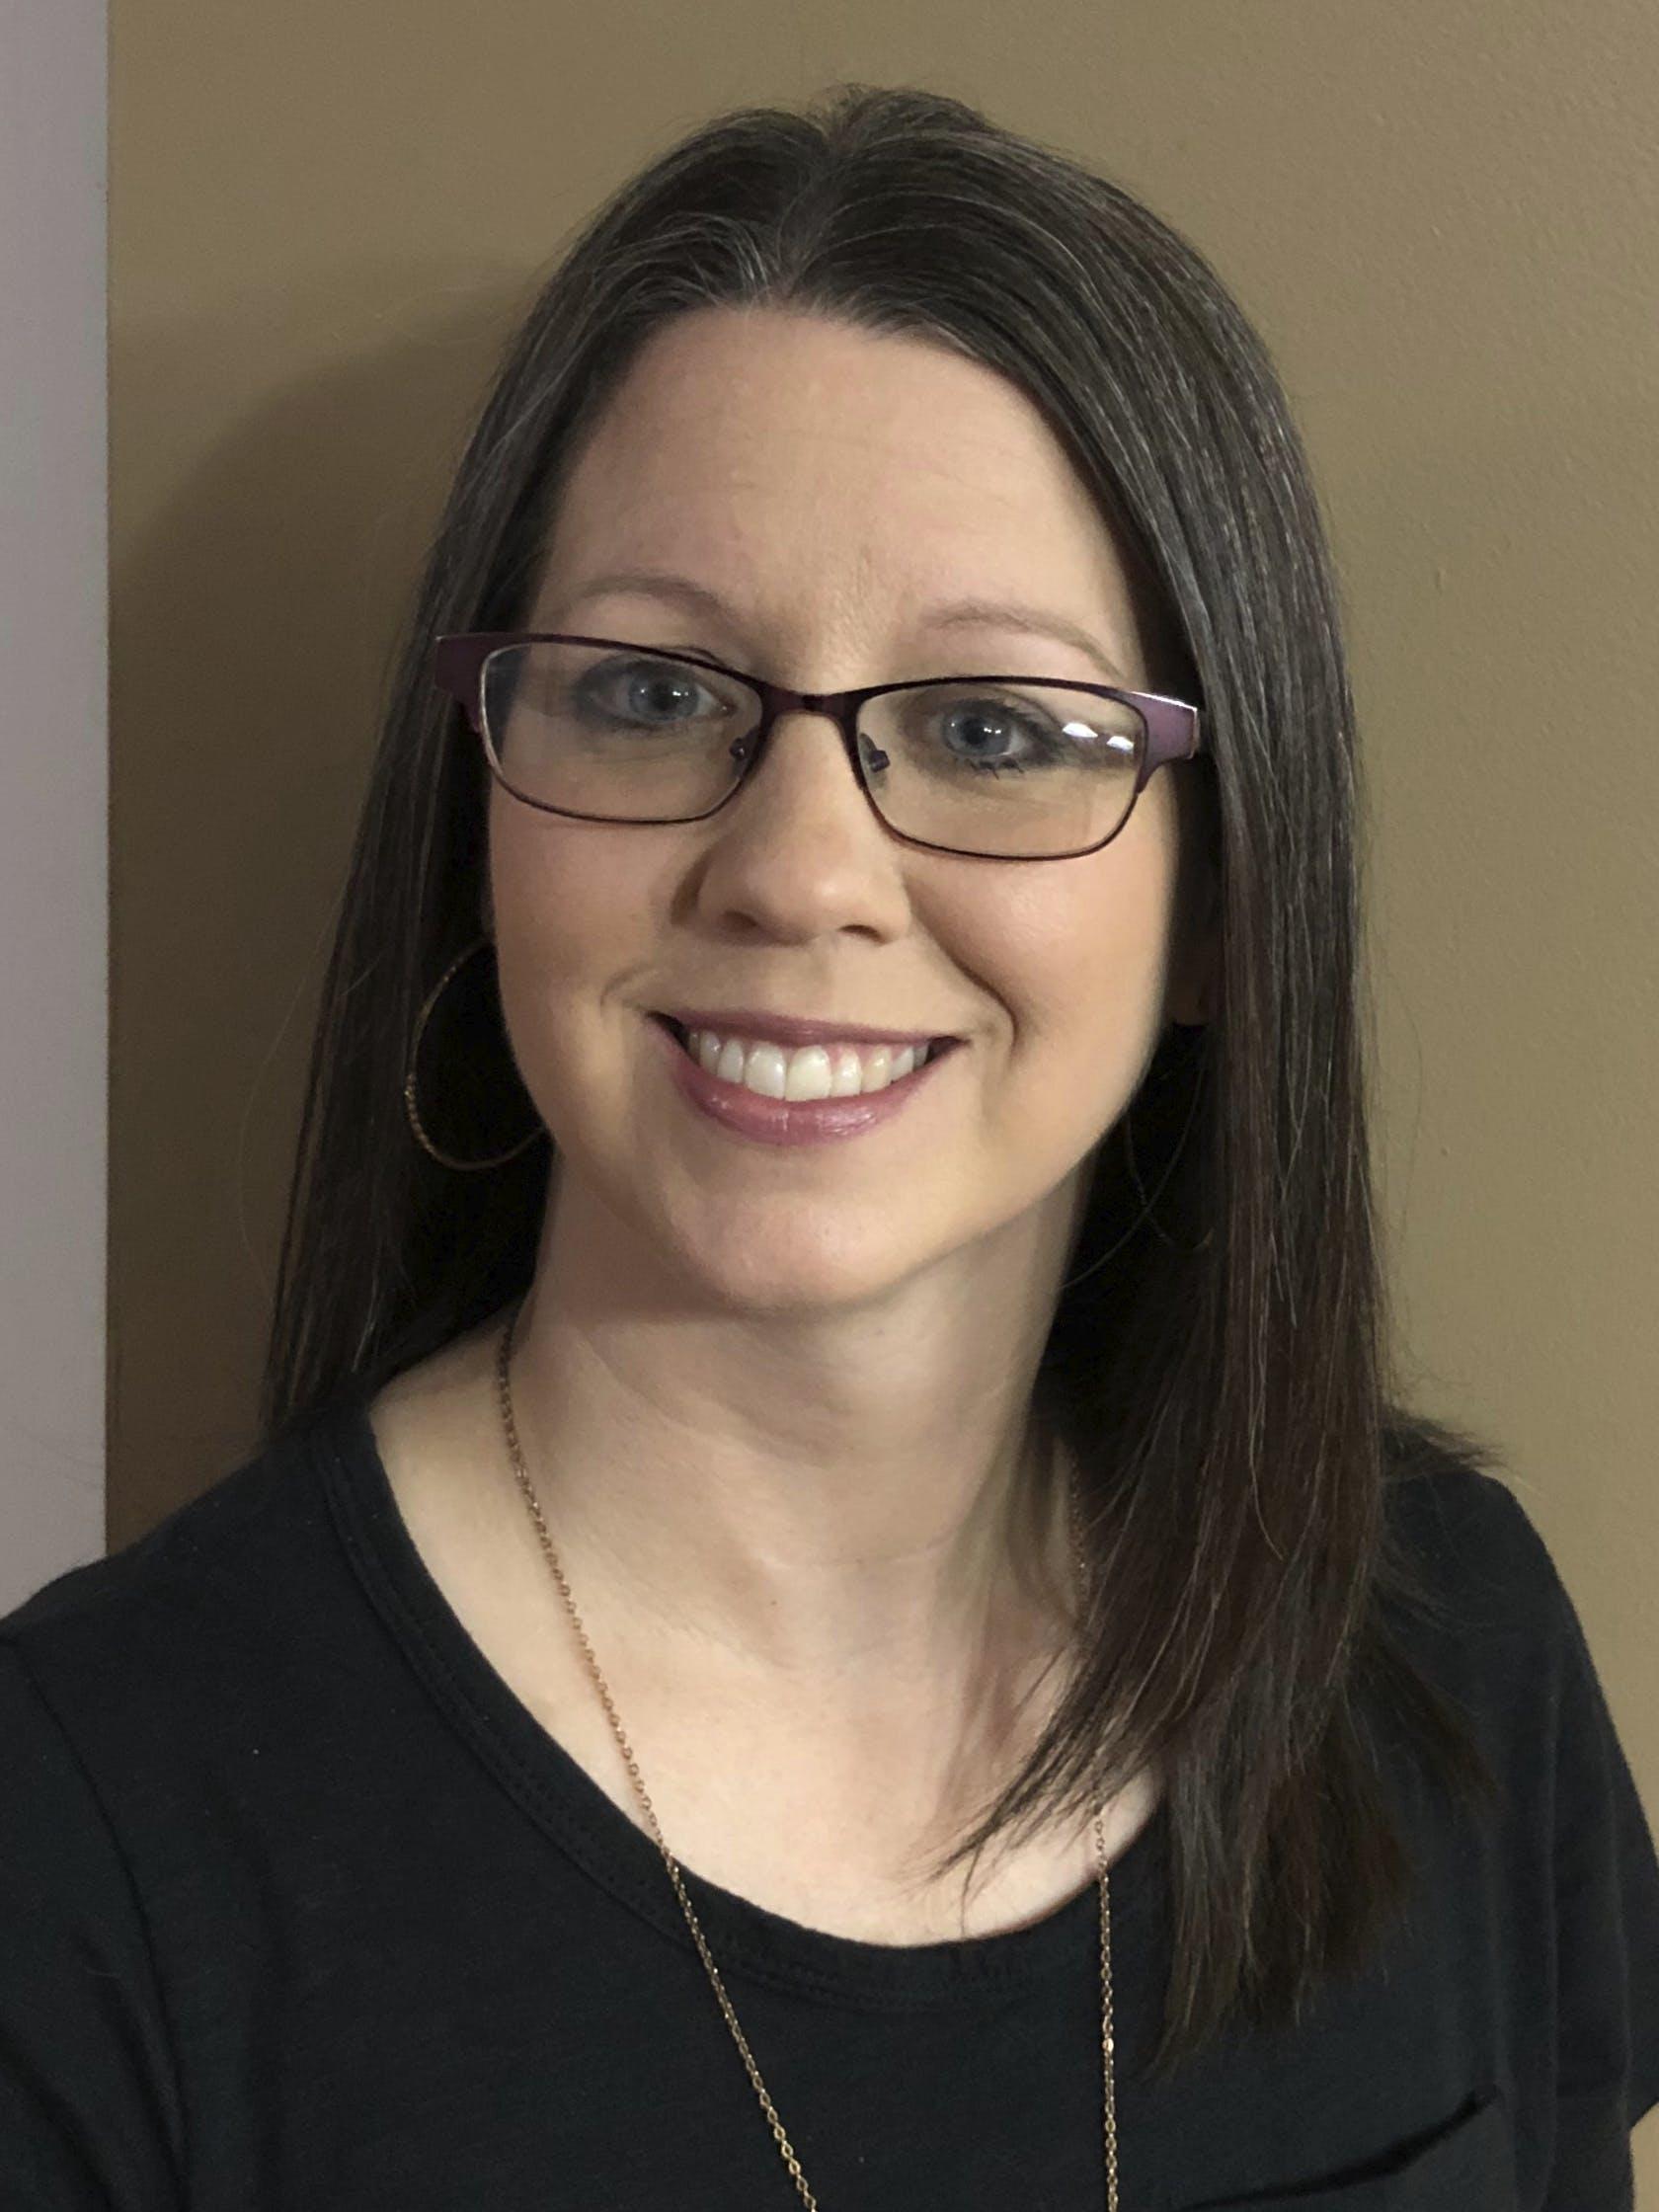 Erin Hoyle